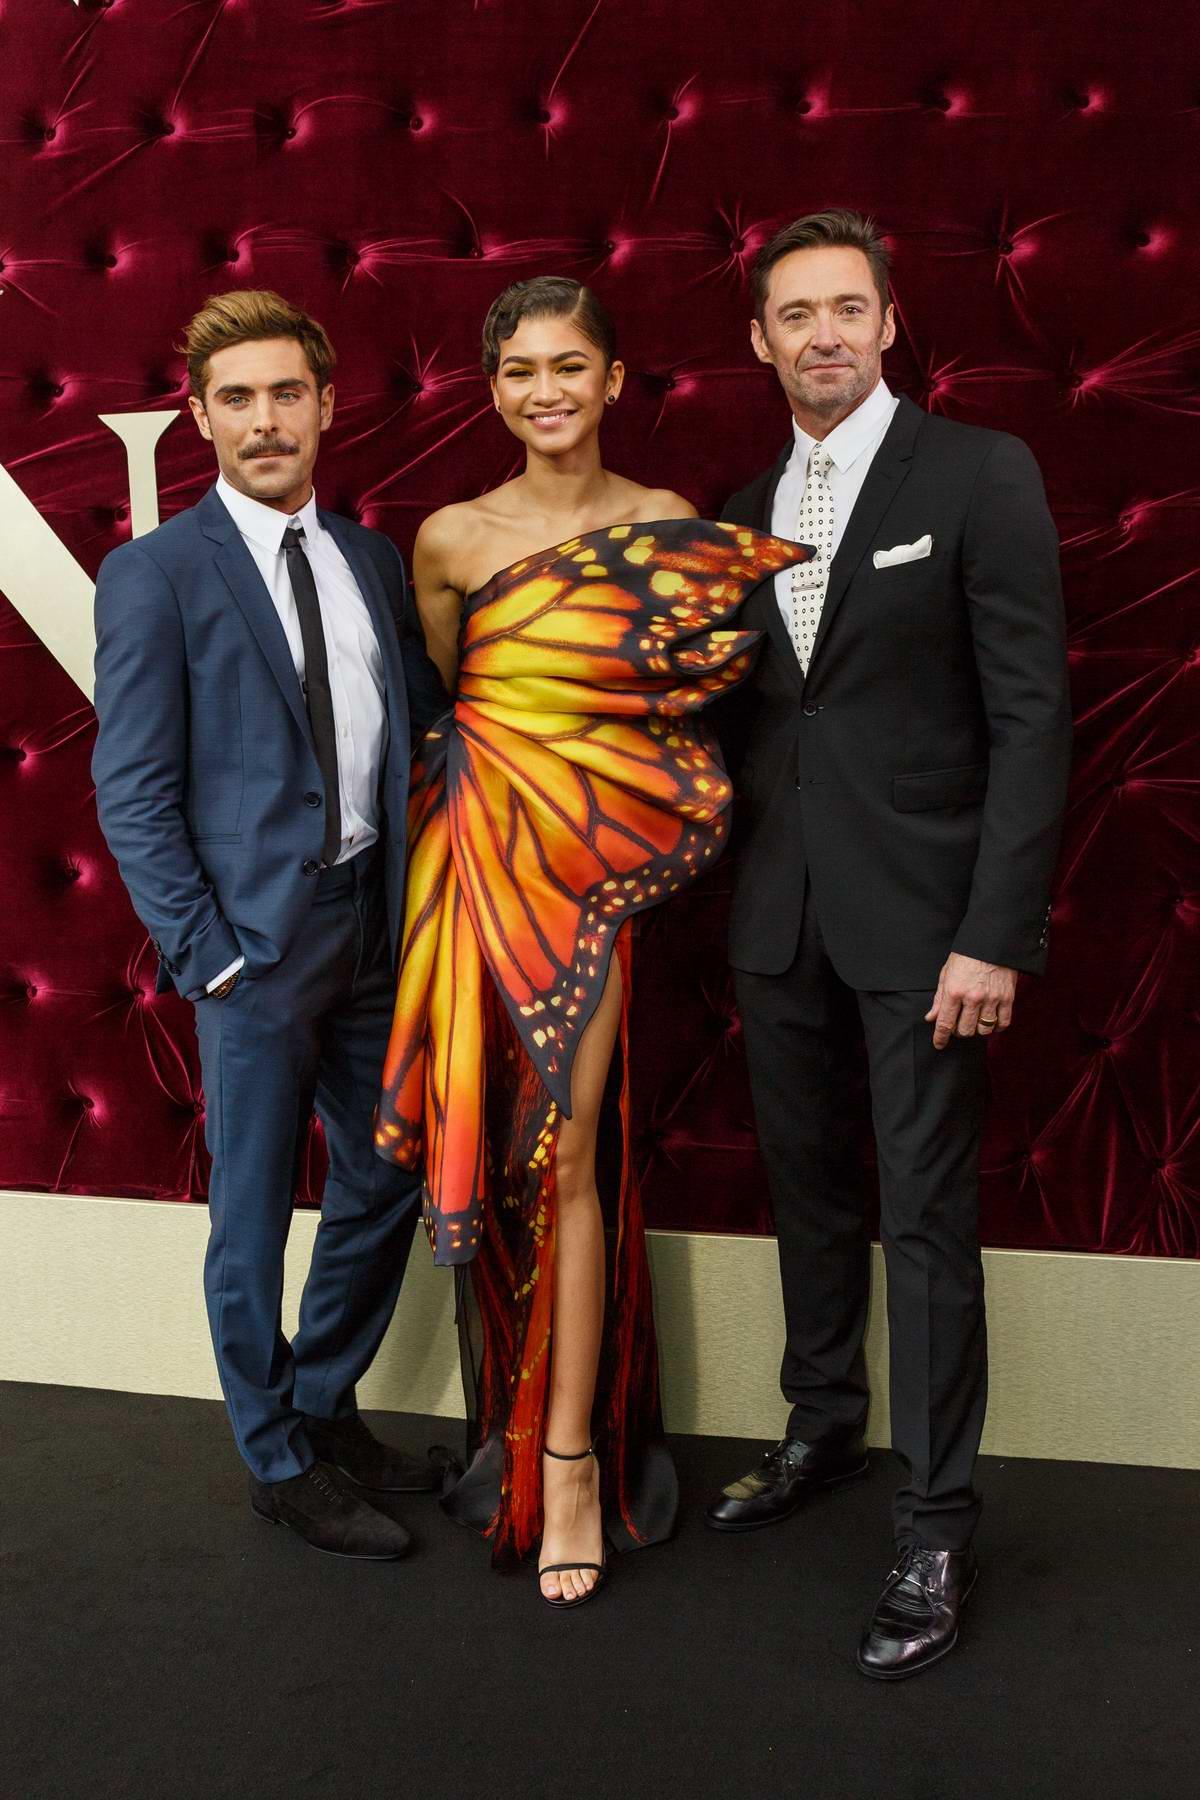 Zendaya Coleman at 'The Greatest Showman' premiere in Sydney, Australia